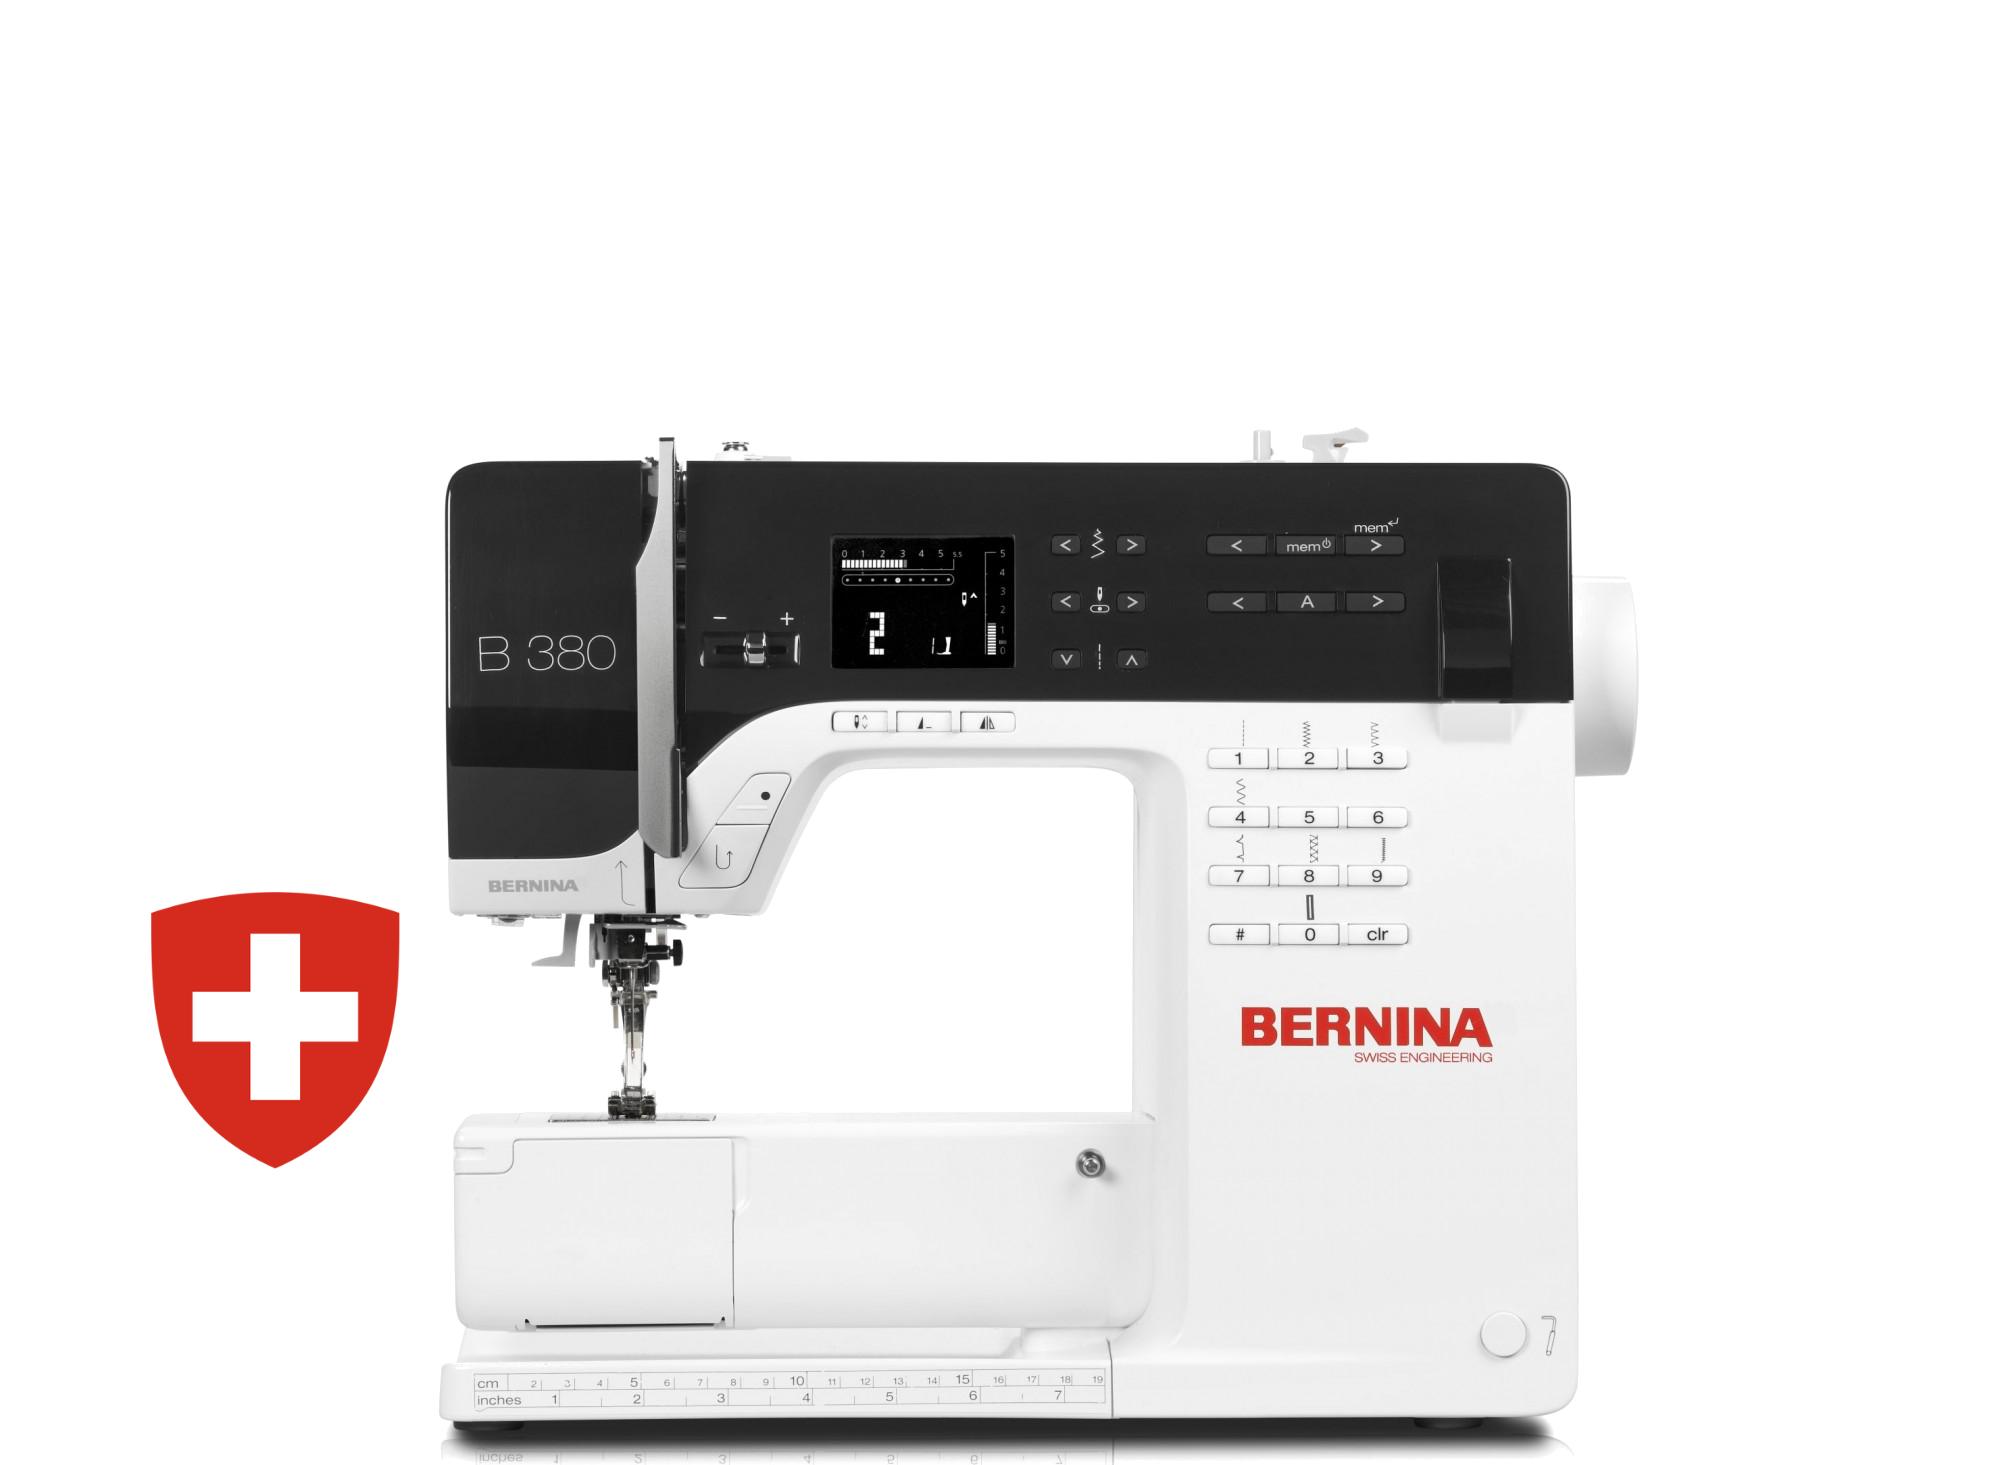 Kompiuterizuota siuvimo mašina BERNINA 380